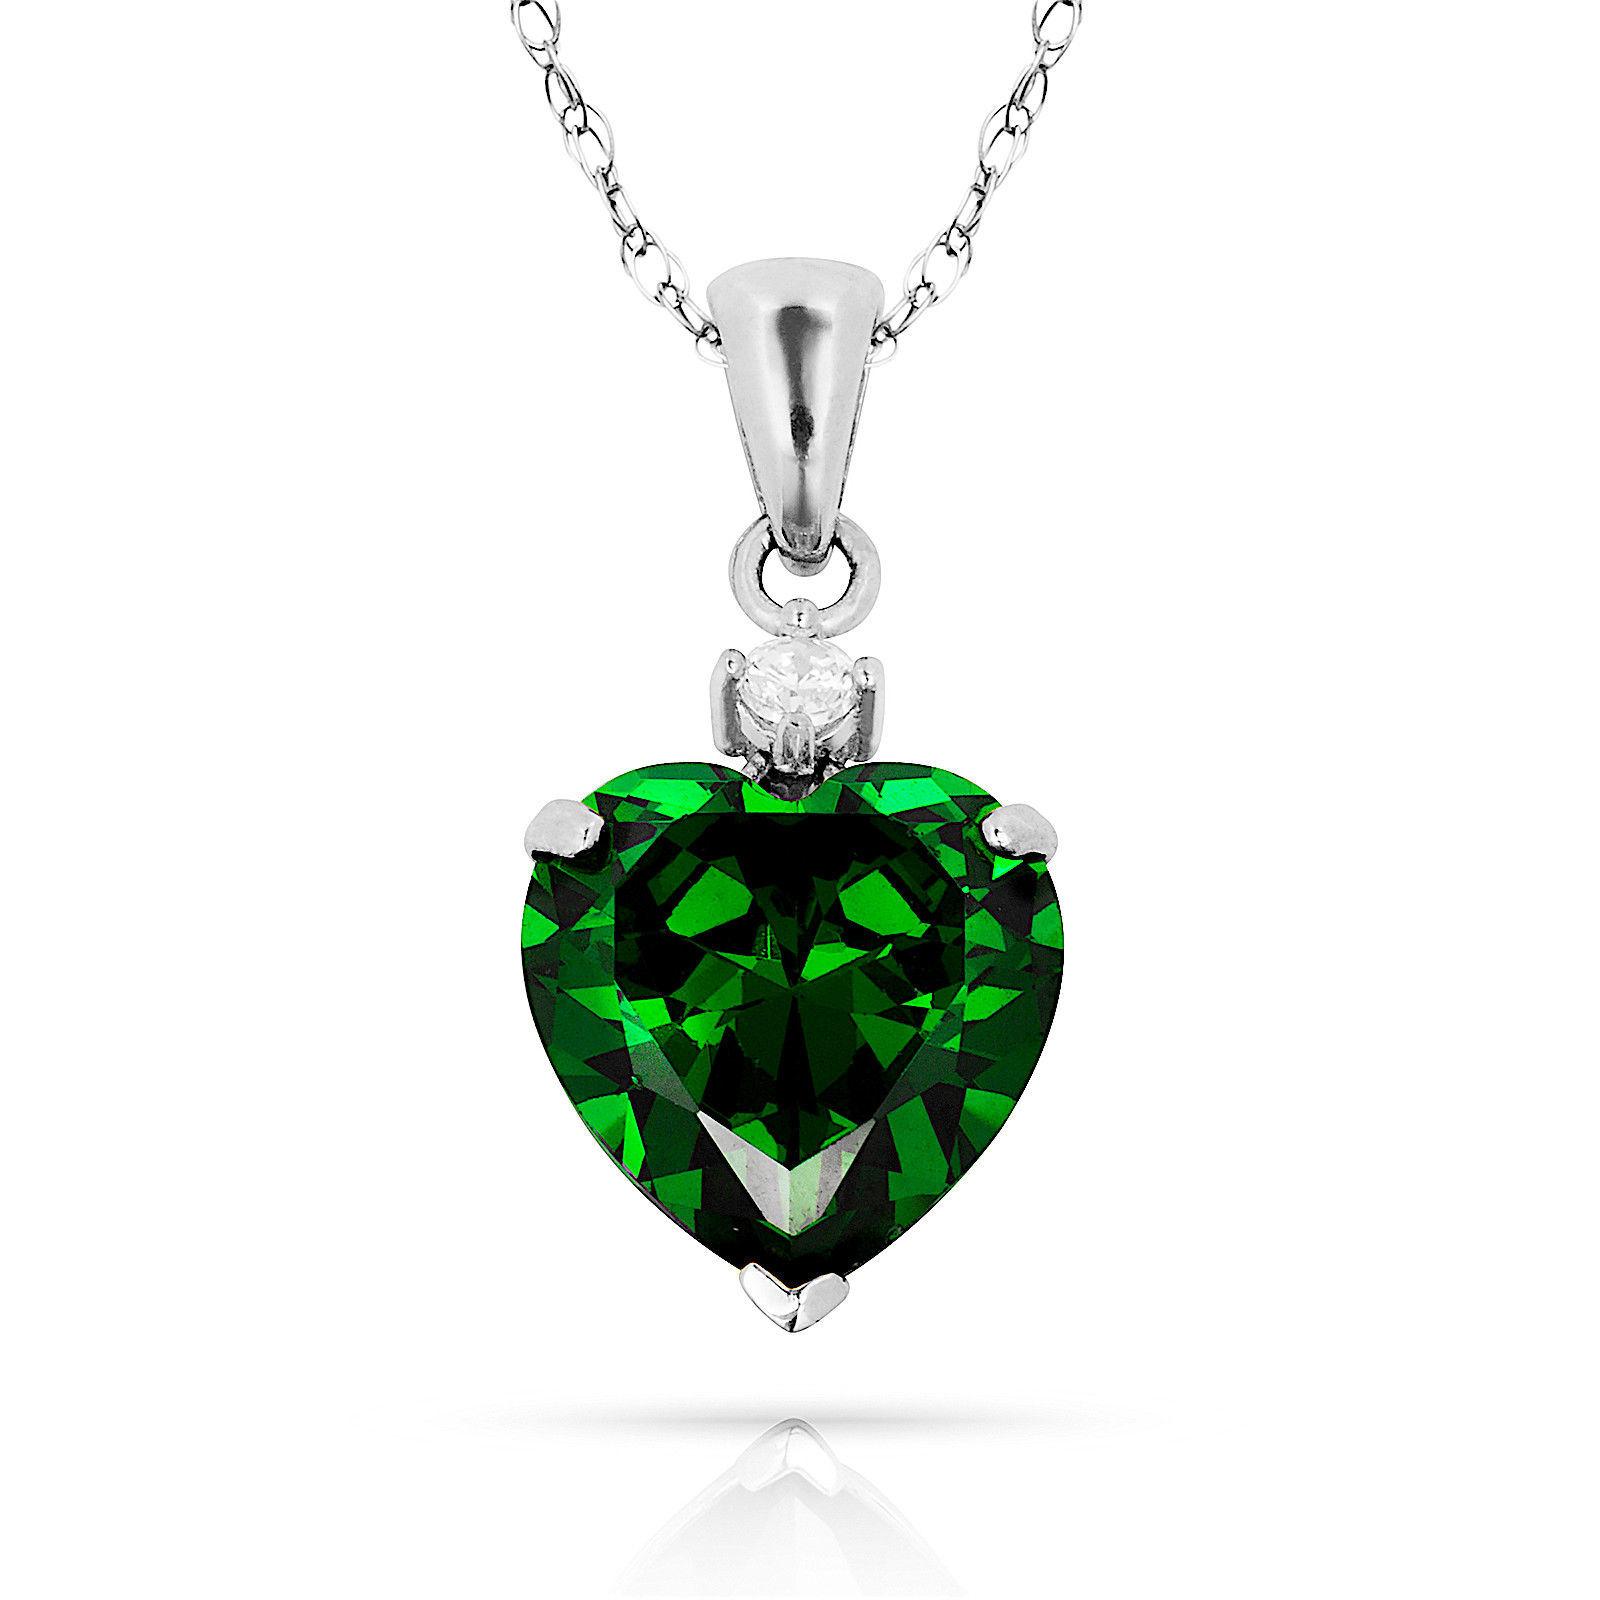 3.07Ct Created Diamond & Heart Emerald Charm Pendant14K White Gold w/Chain